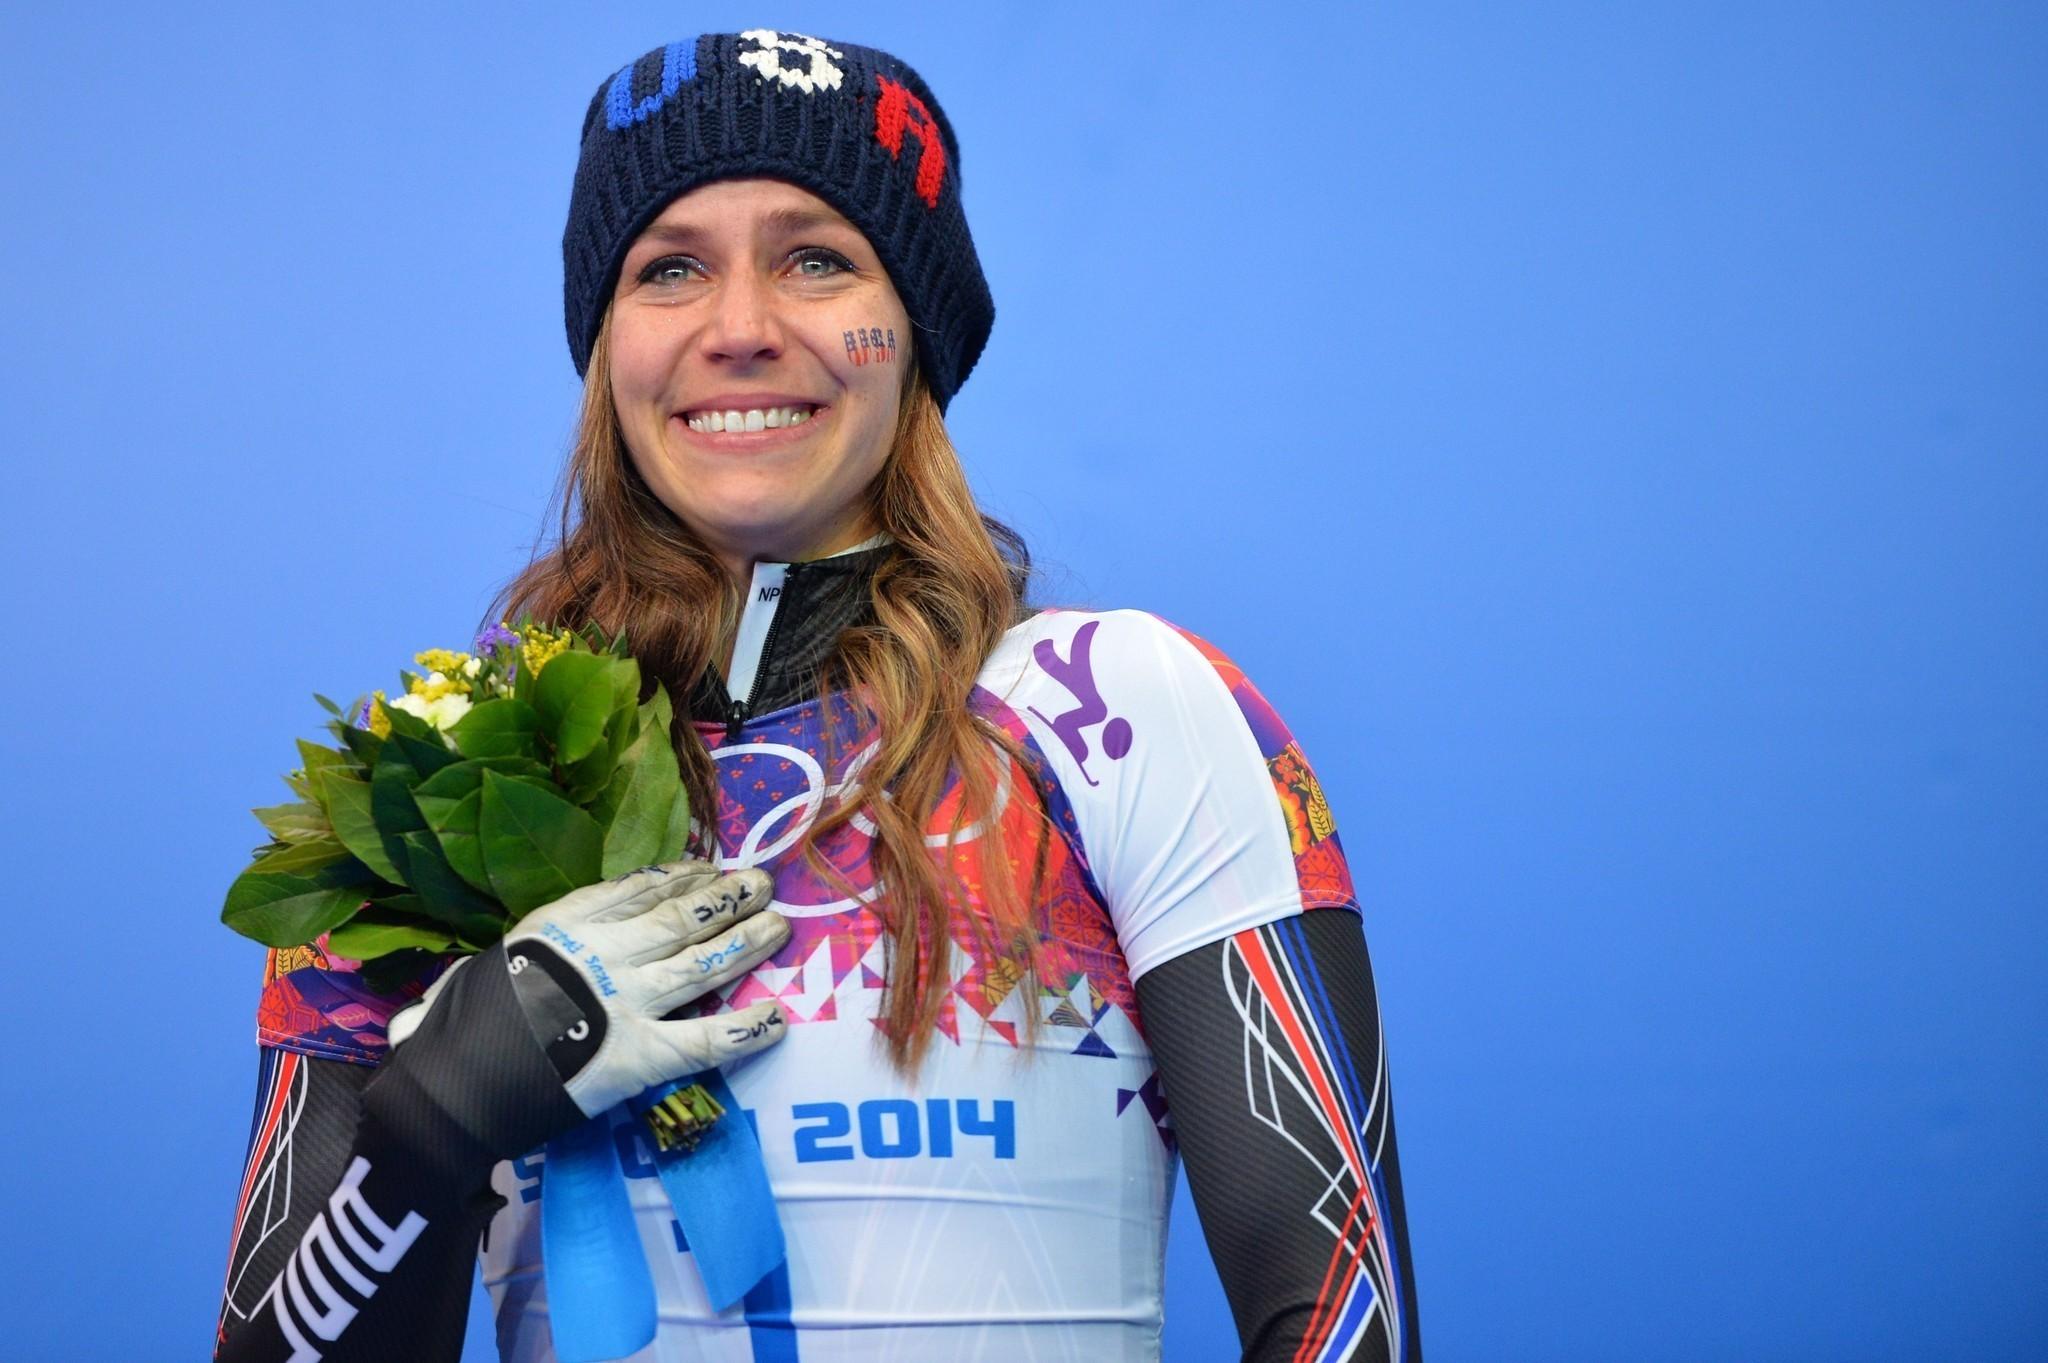 Sochi Olympics: Noelle Pikus-Pace takes silver in women's skeleton